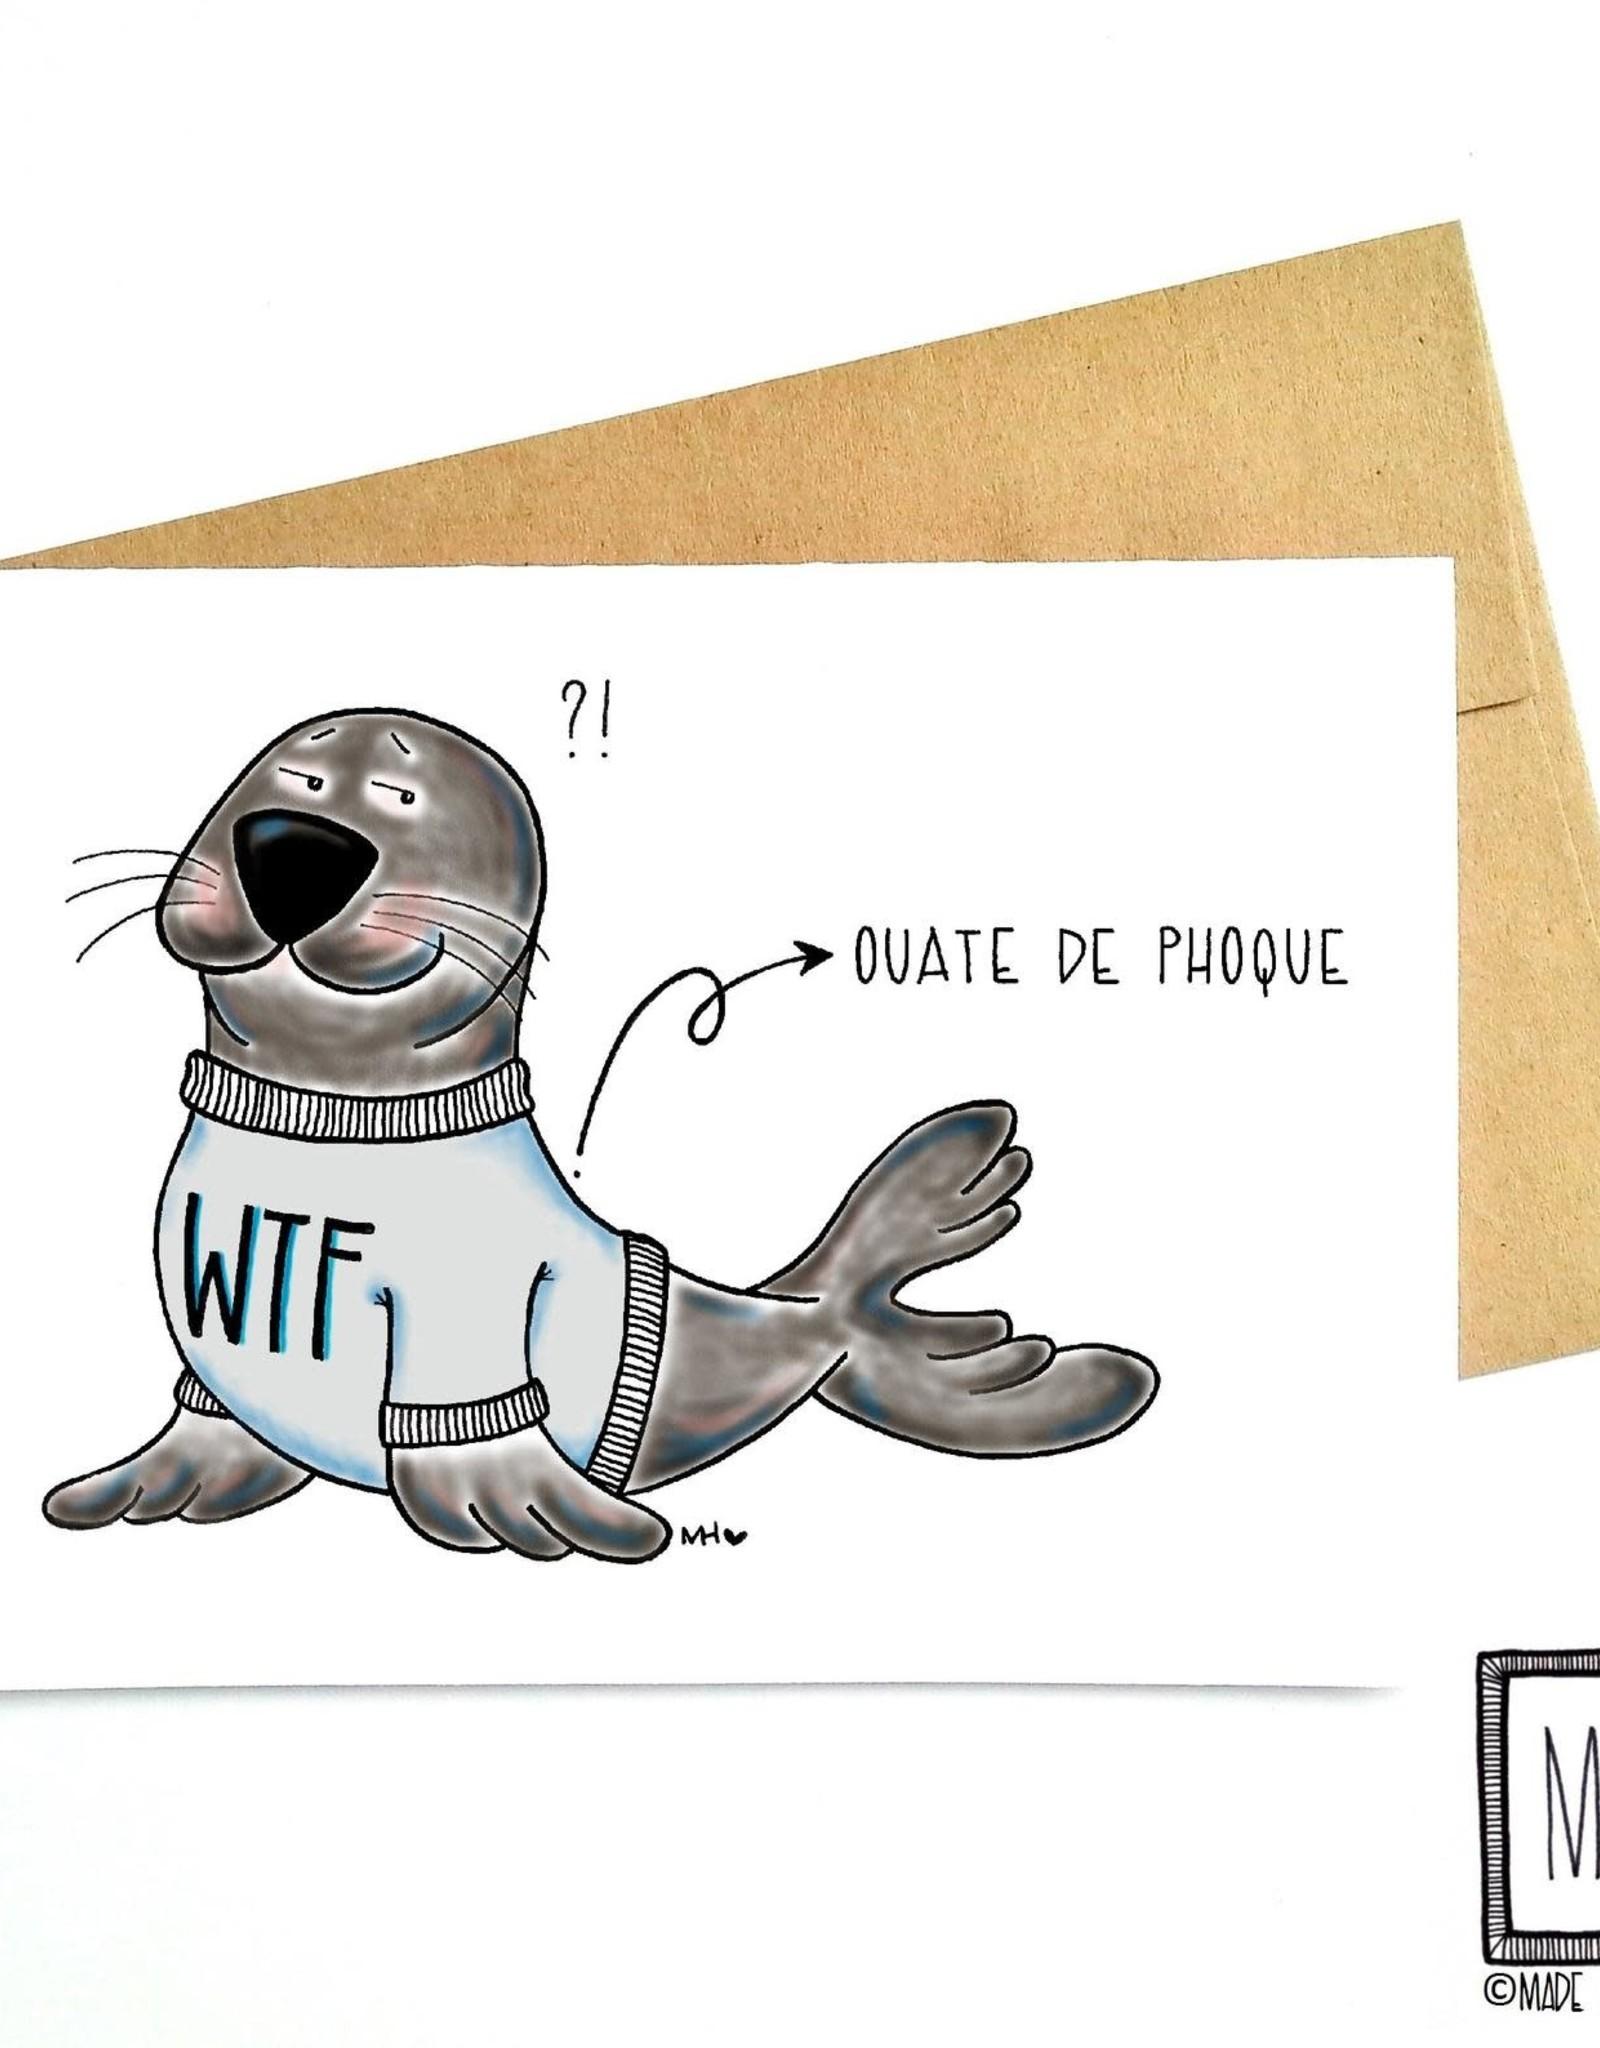 Made in Happy Carte de souhait - Ouate de phoque